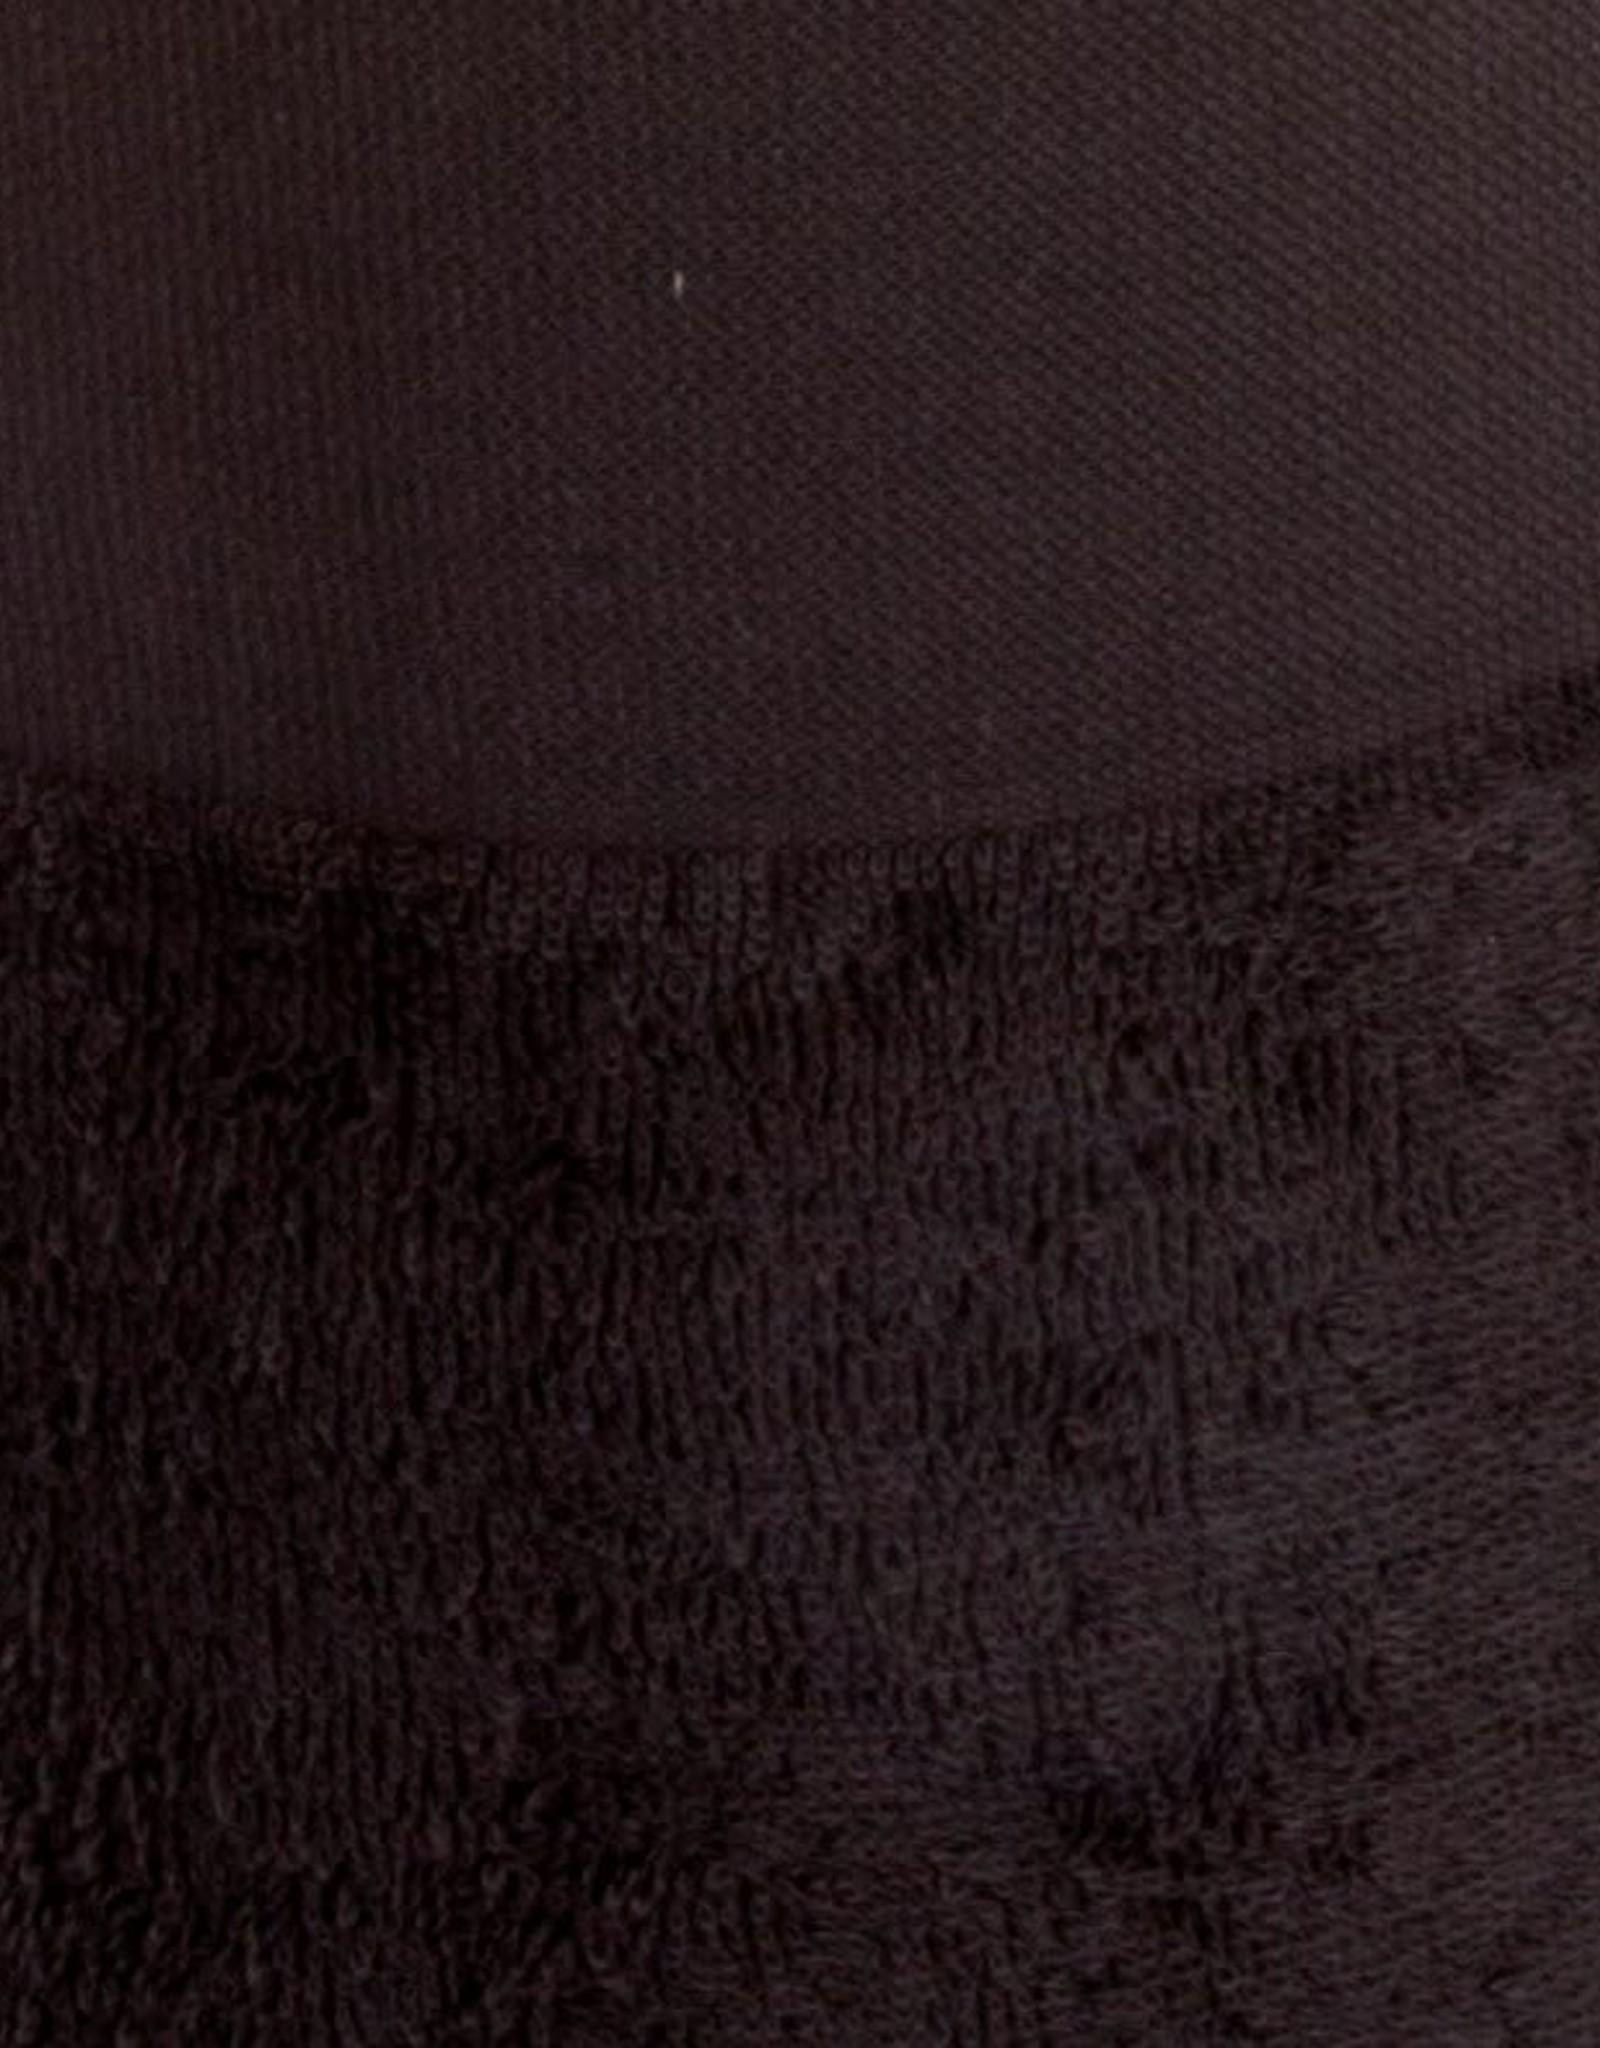 Iris Hantverk Towel 100% Cotton